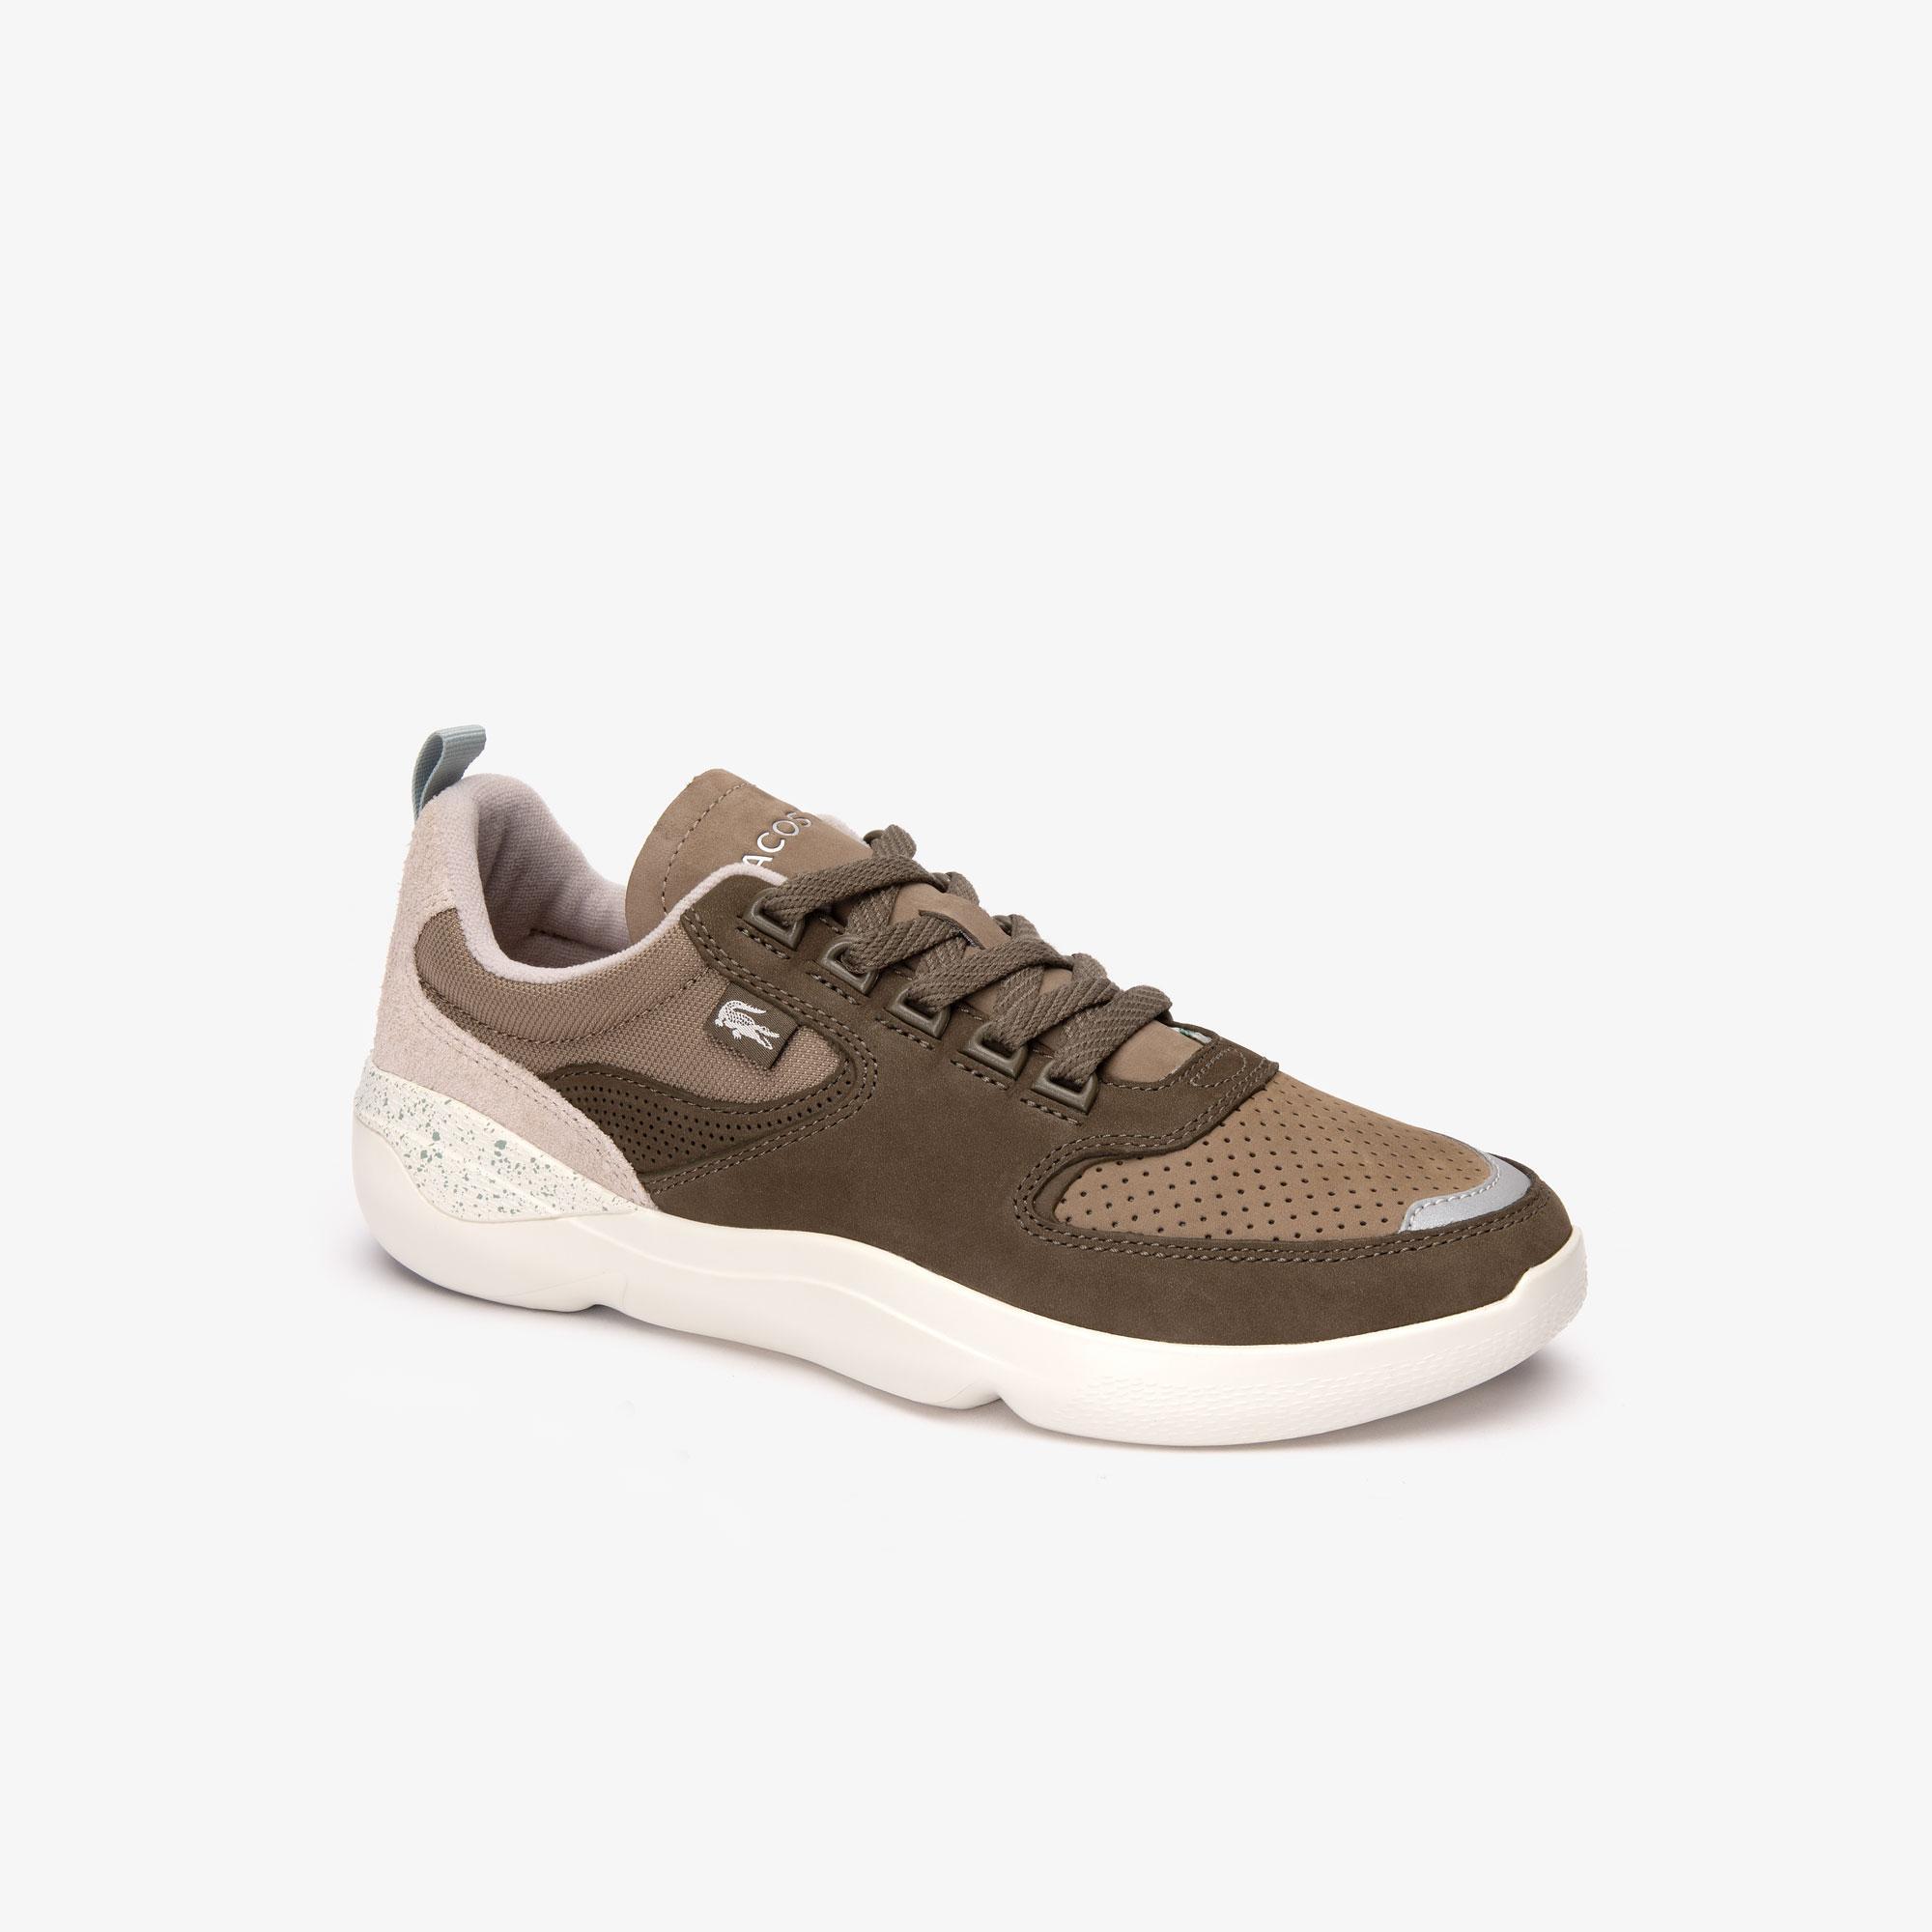 Lacoste Wildcard 419 1 SMA Erkek  Kahverengi - Bej Sneaker